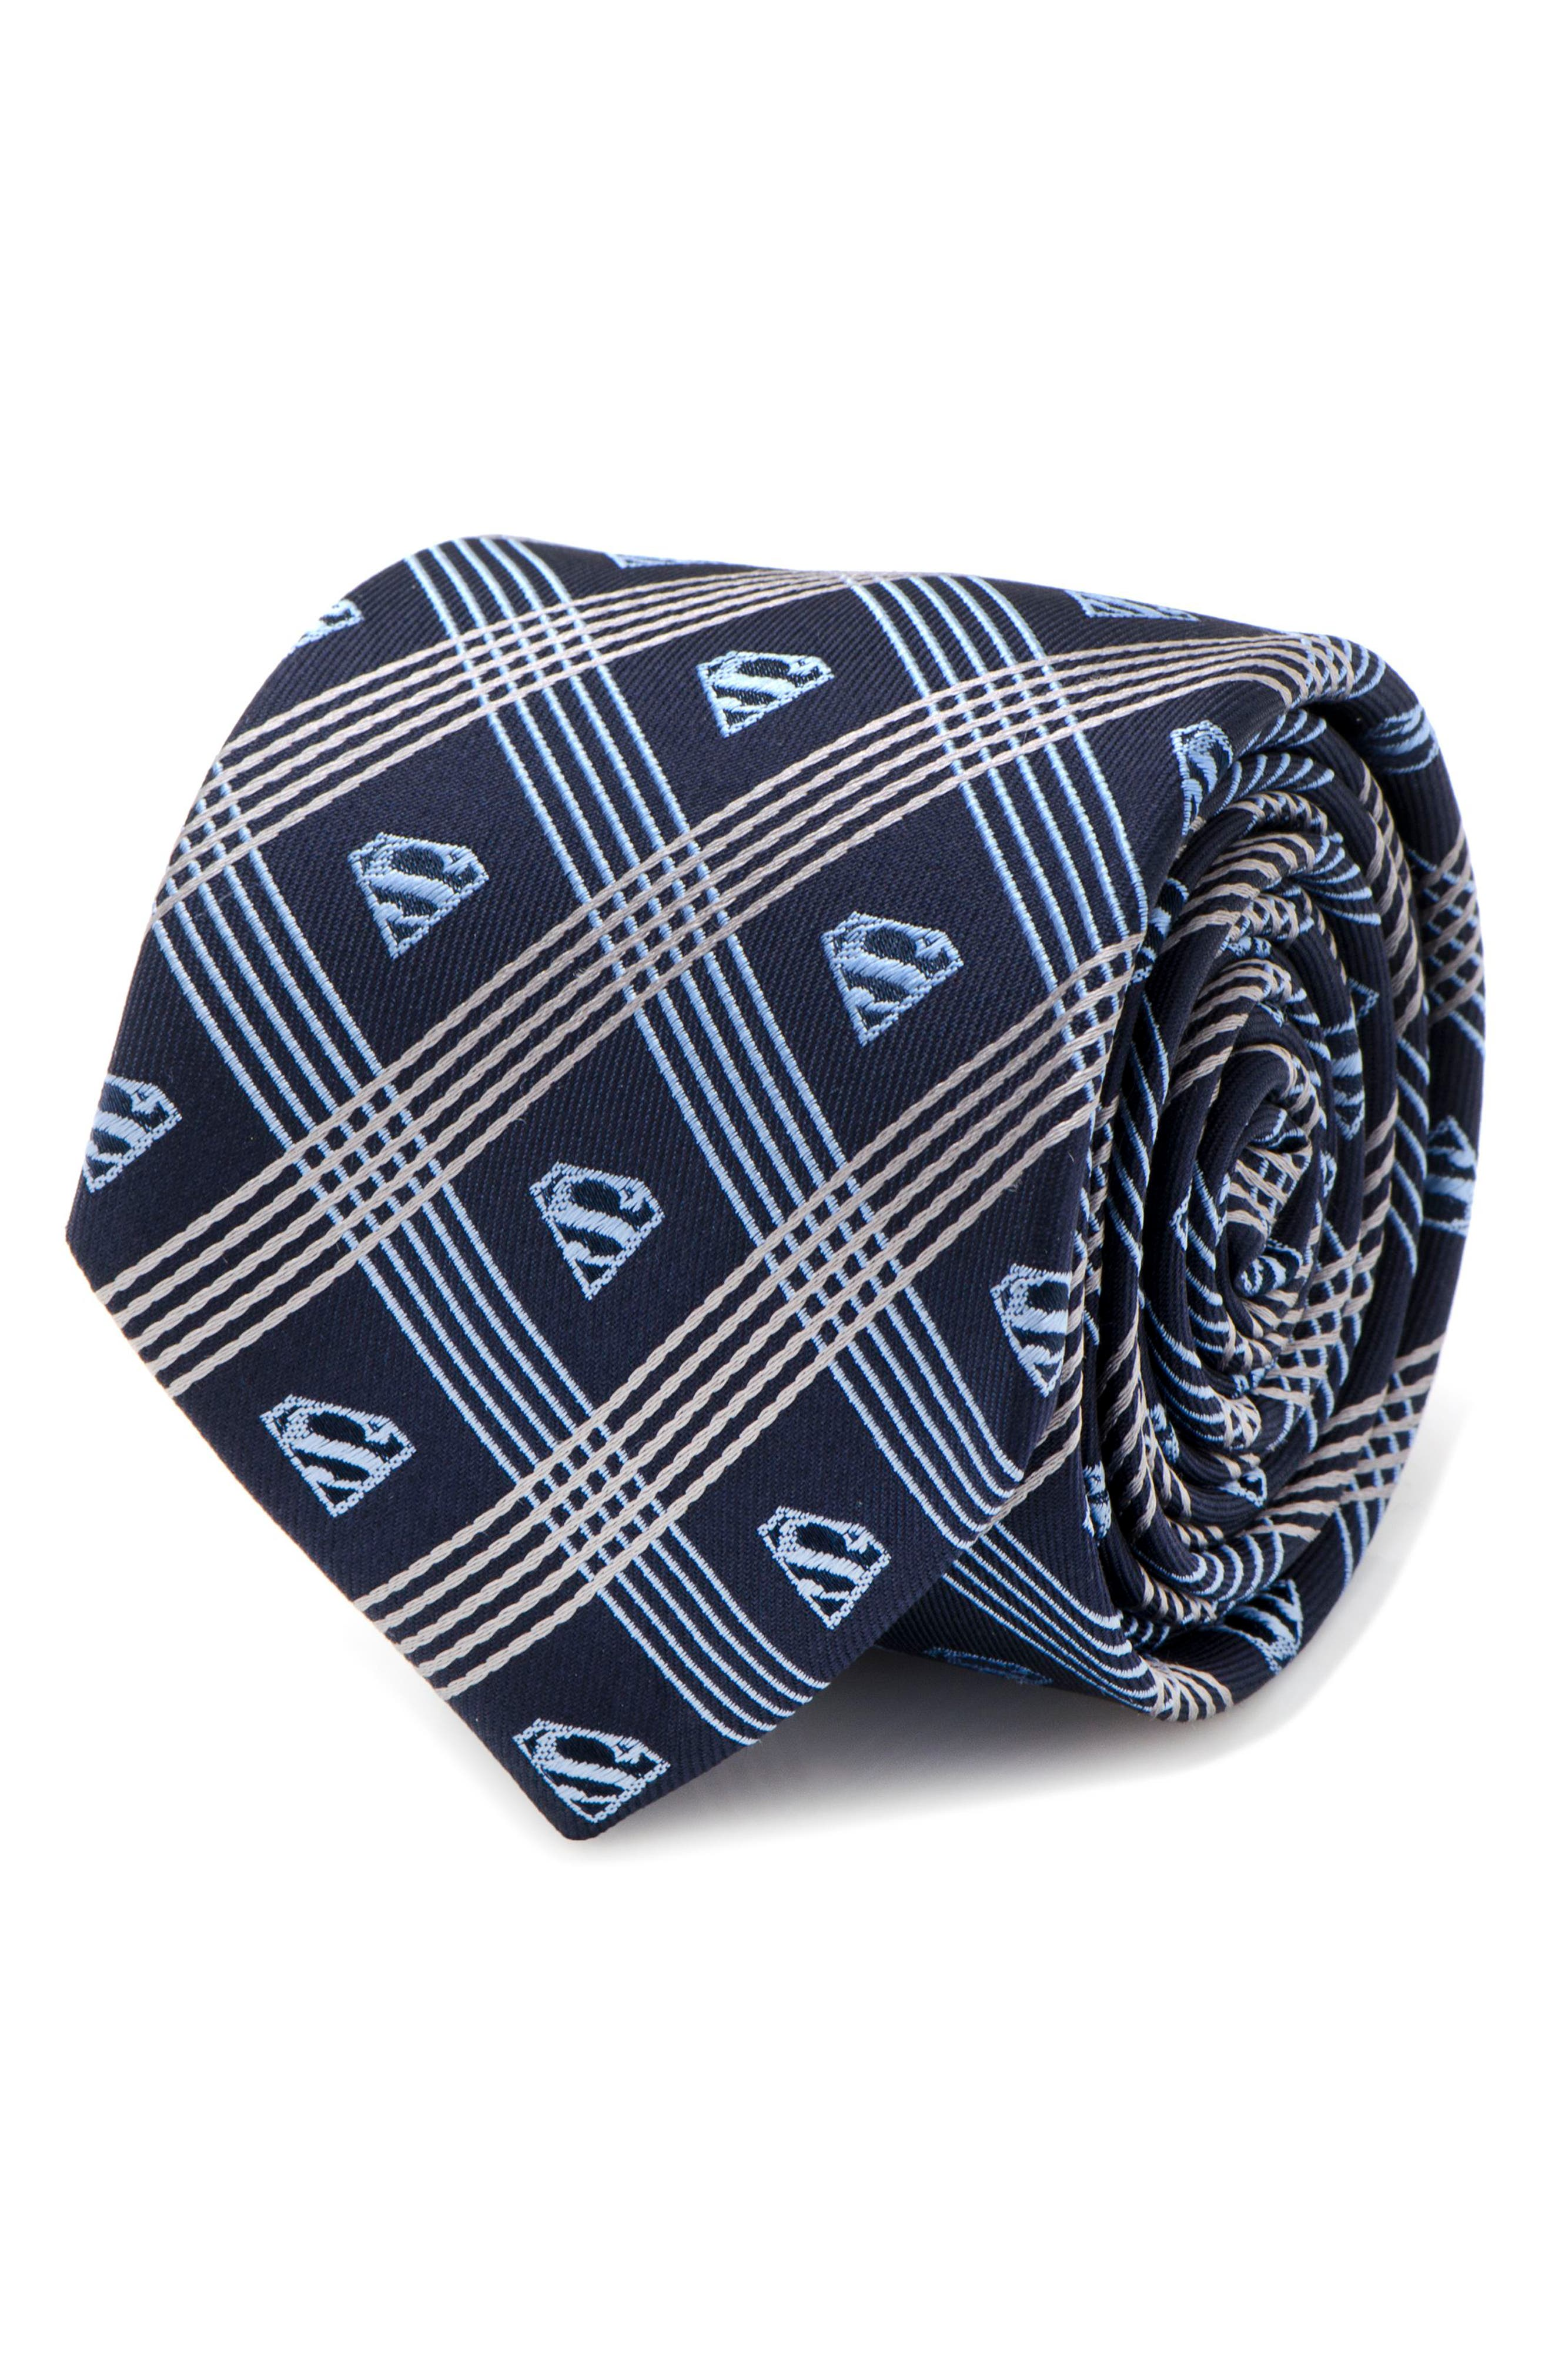 Superman Shield Silk Tie,                             Alternate thumbnail 4, color,                             Grey/ Navy